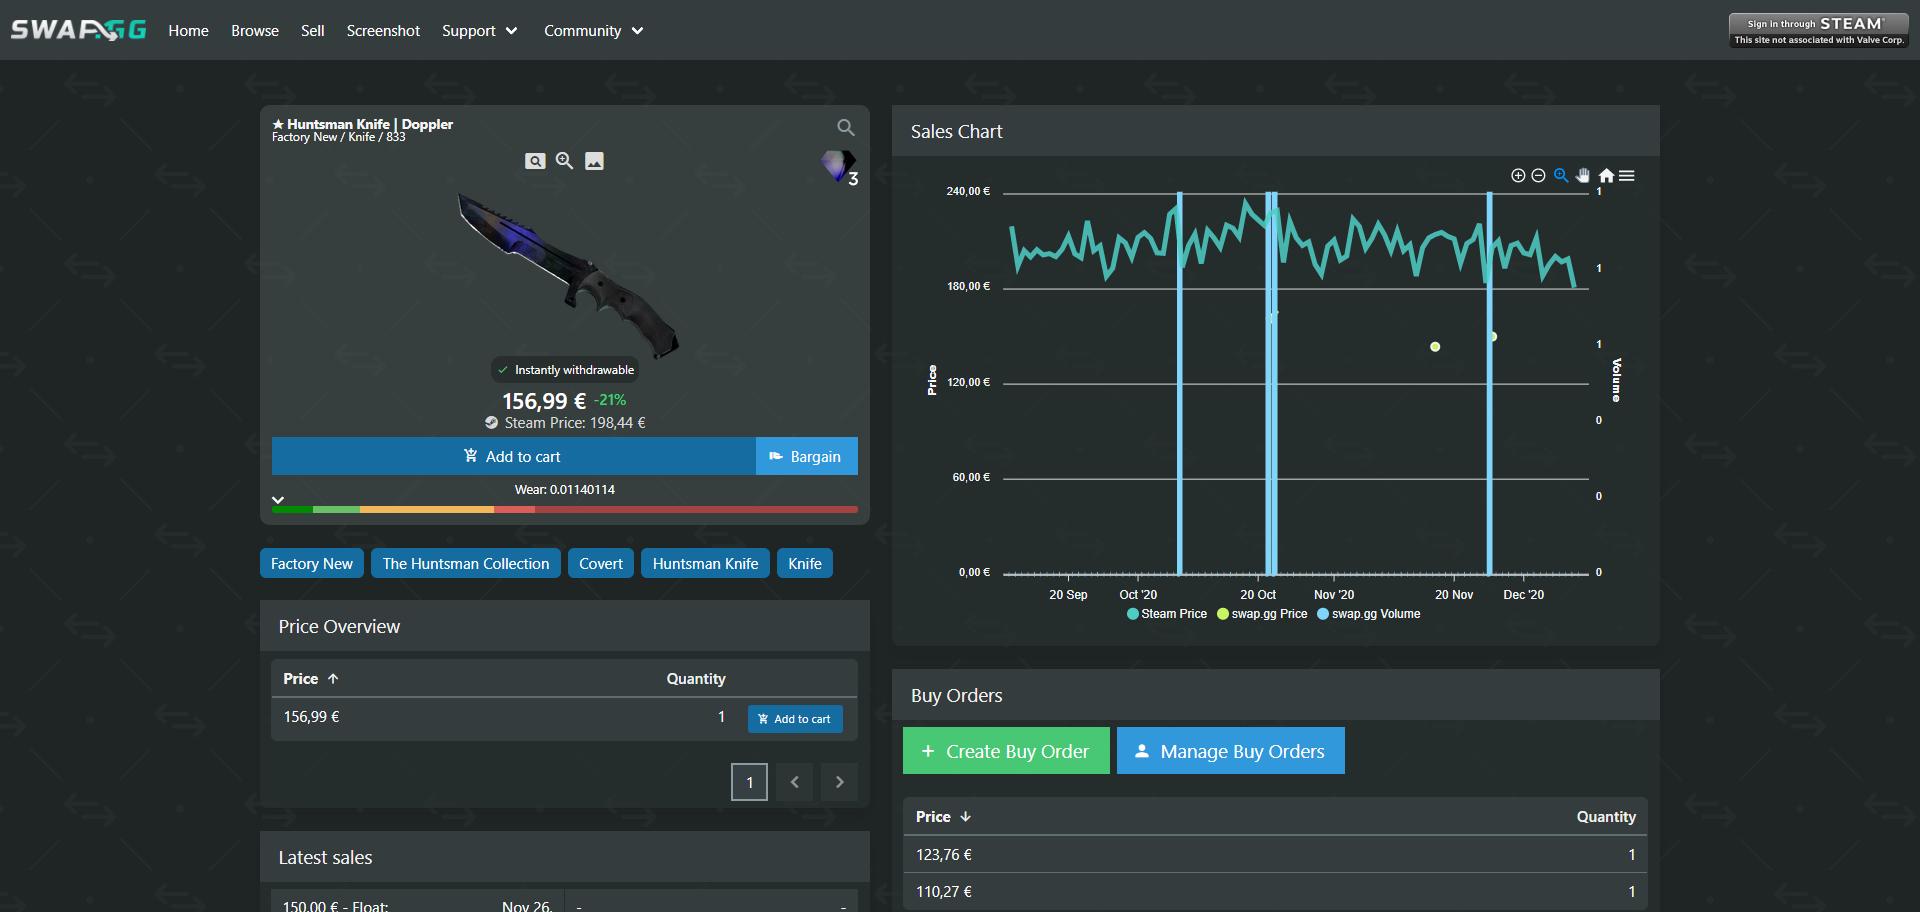 Swap.gg Review Screenshot